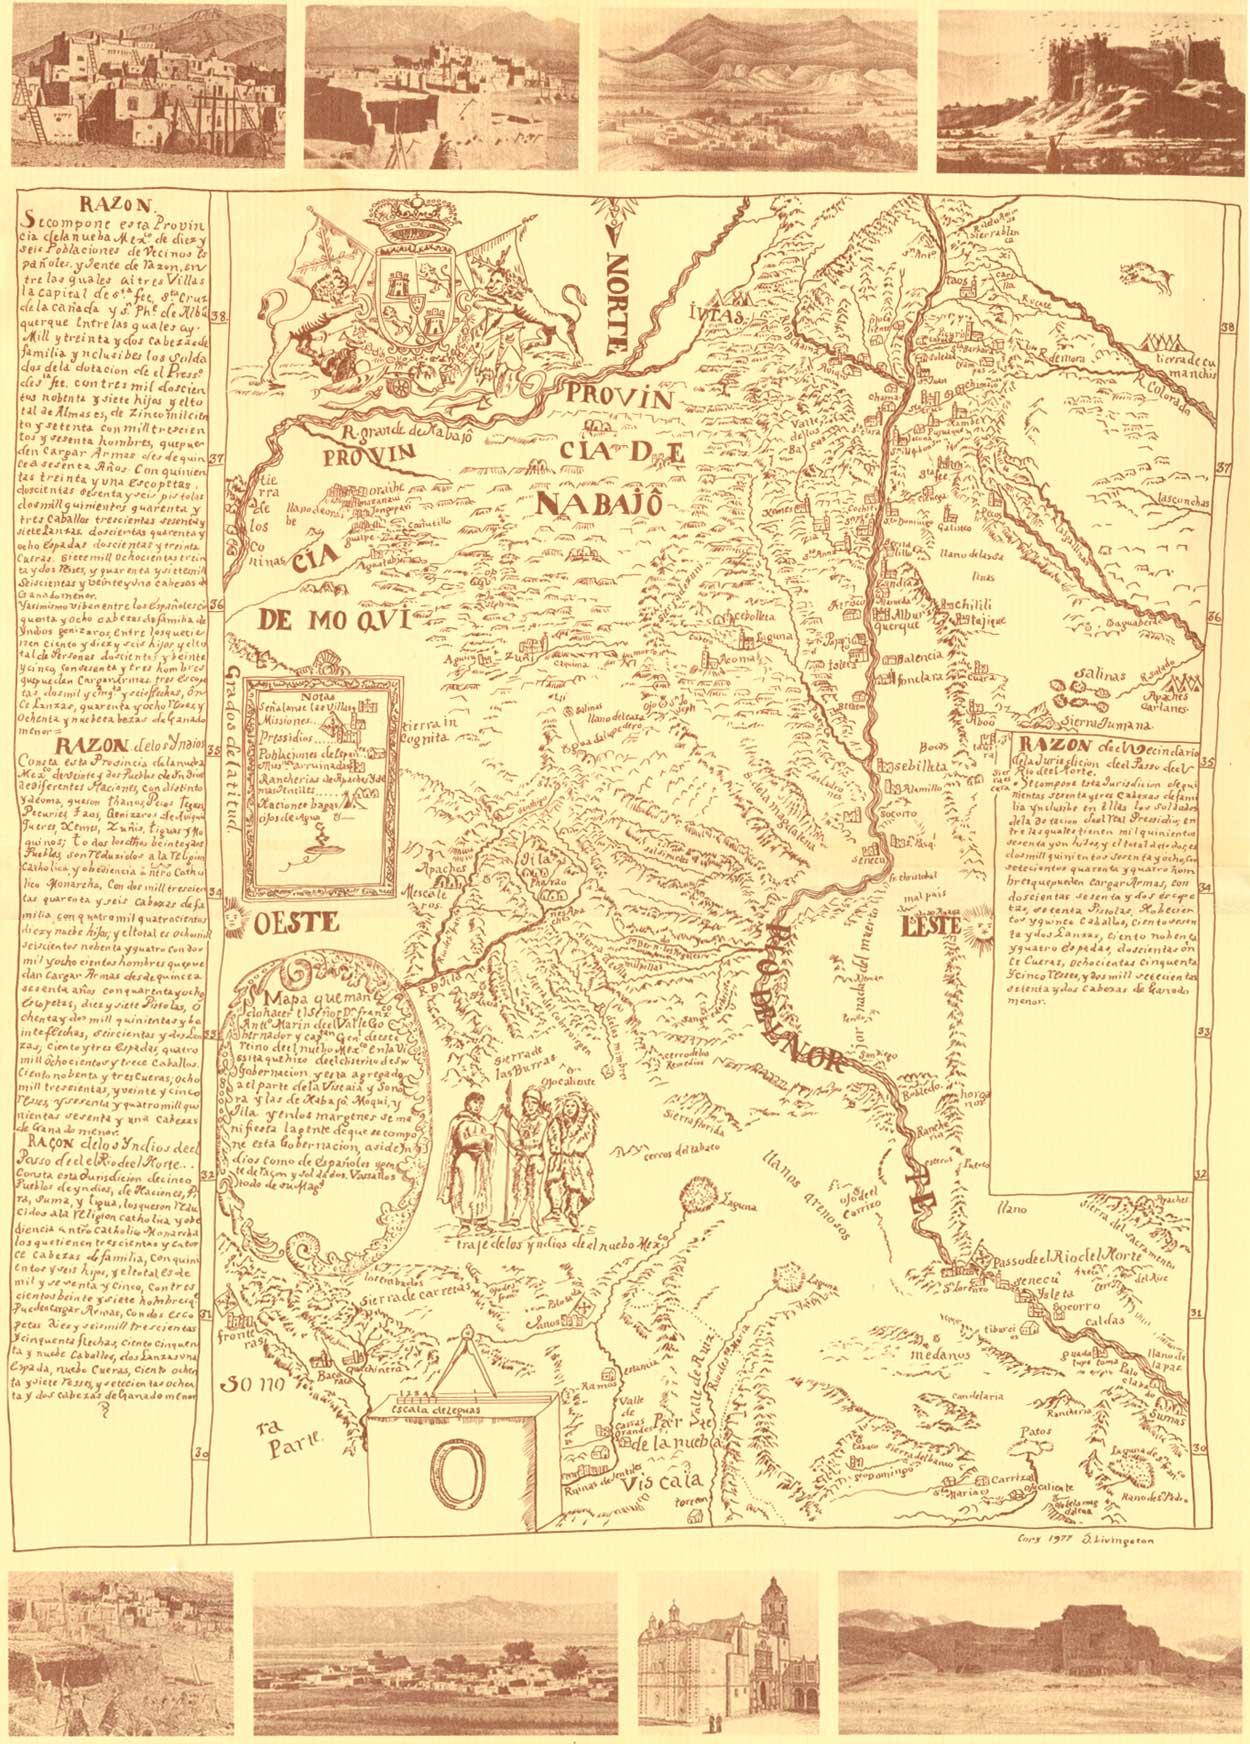 medium resolution of For Educators - Albuquerque Historical Society